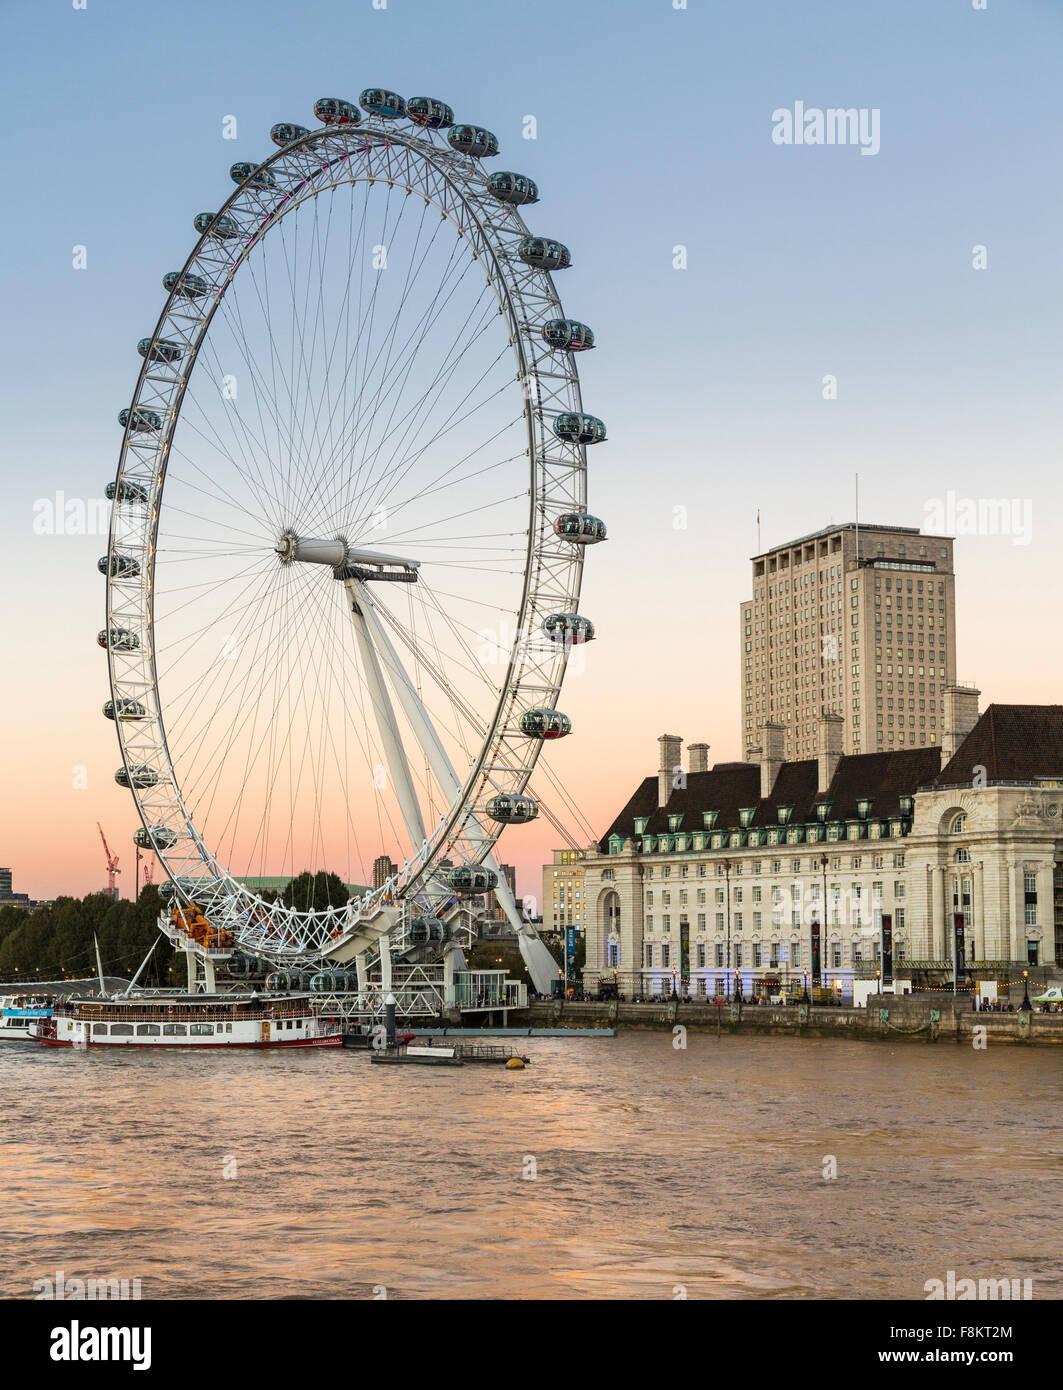 London Eye oder Millennium Wheel am Südufer der Themse in London England, UK Stockbild